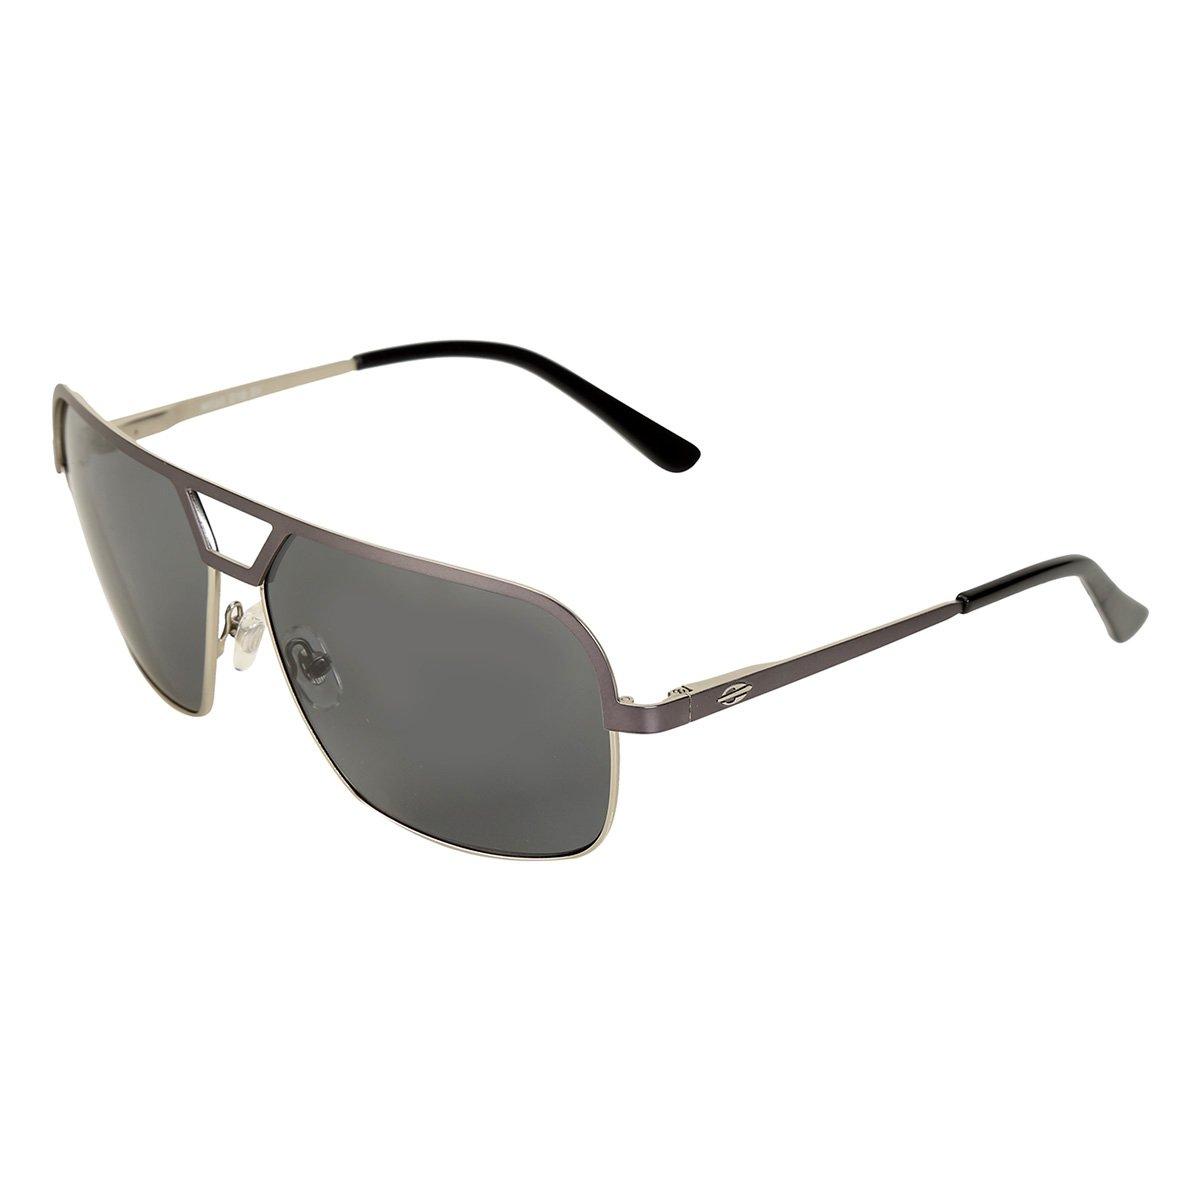 0d541a9324d1e Óculos de Sol Mormaii Metal Masculino - Compre Agora